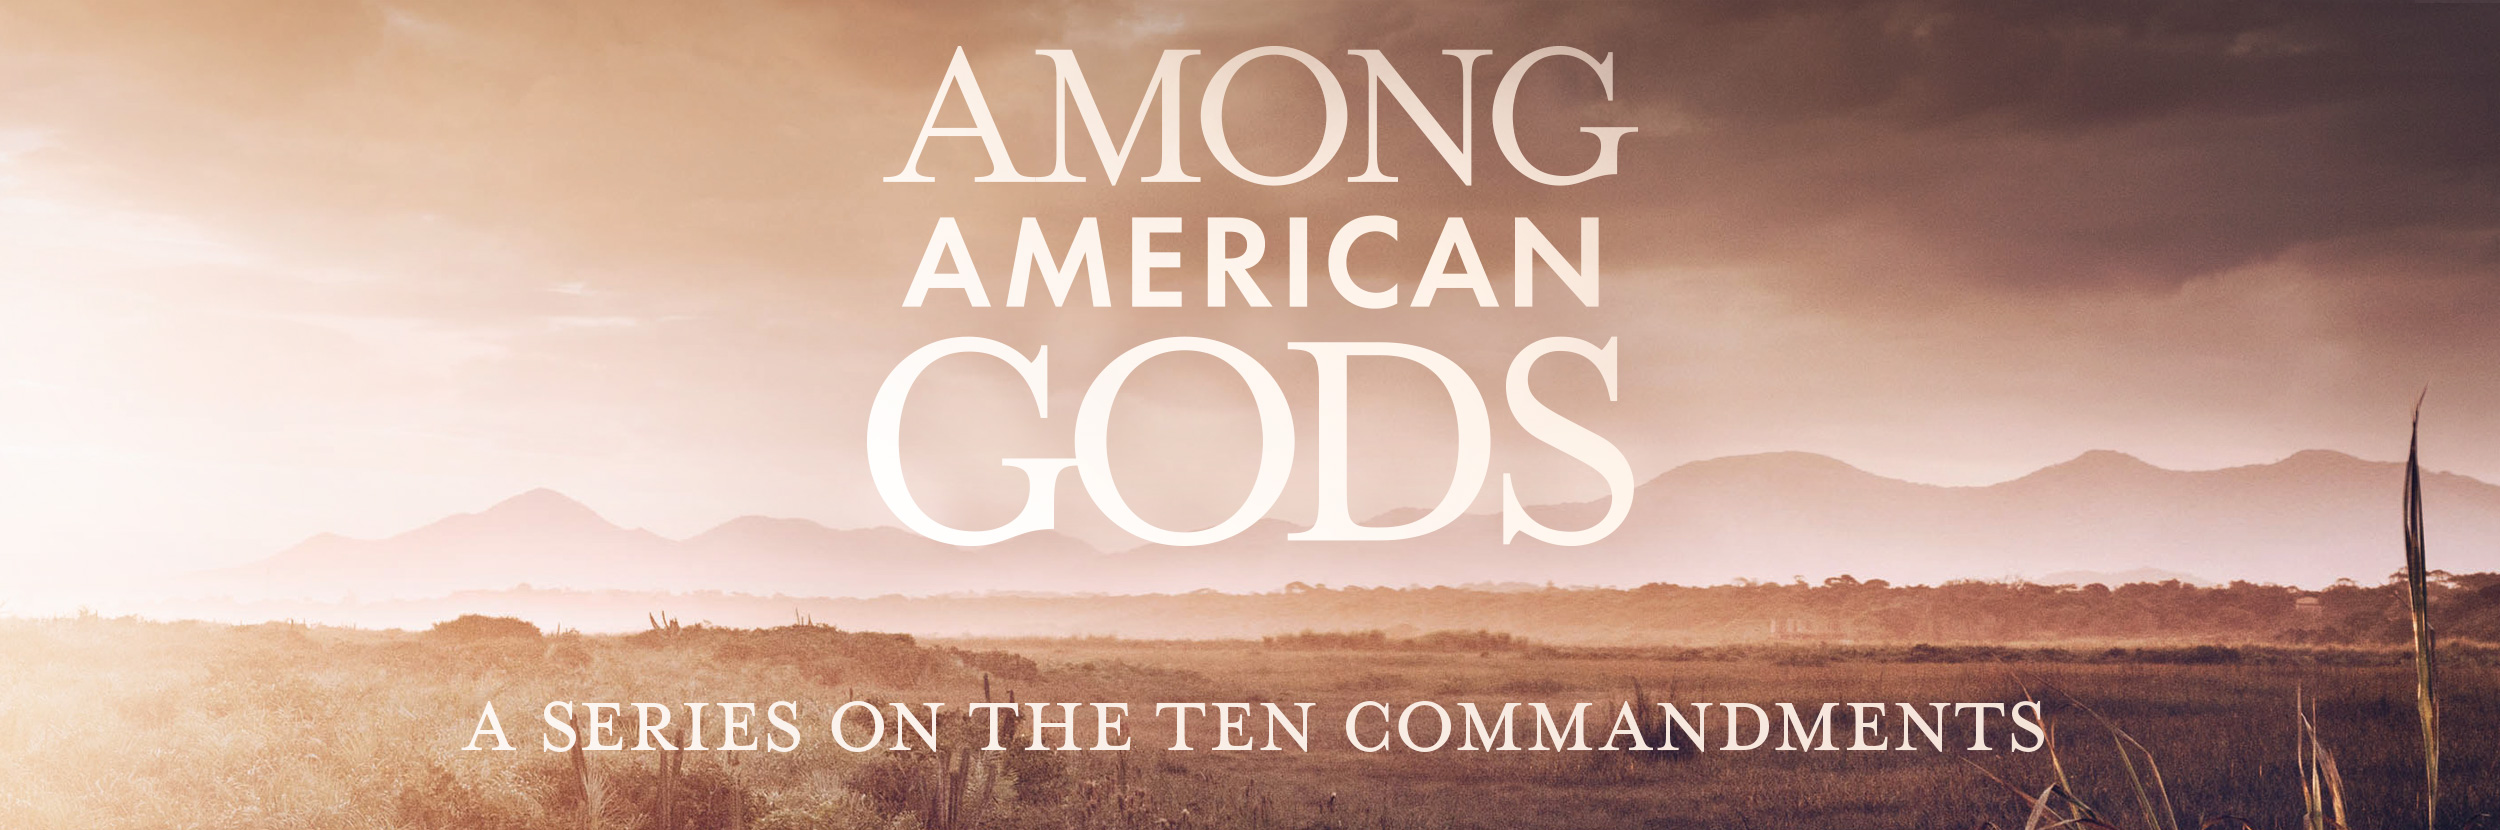 among-american-gods-banner-2500x830.jpg